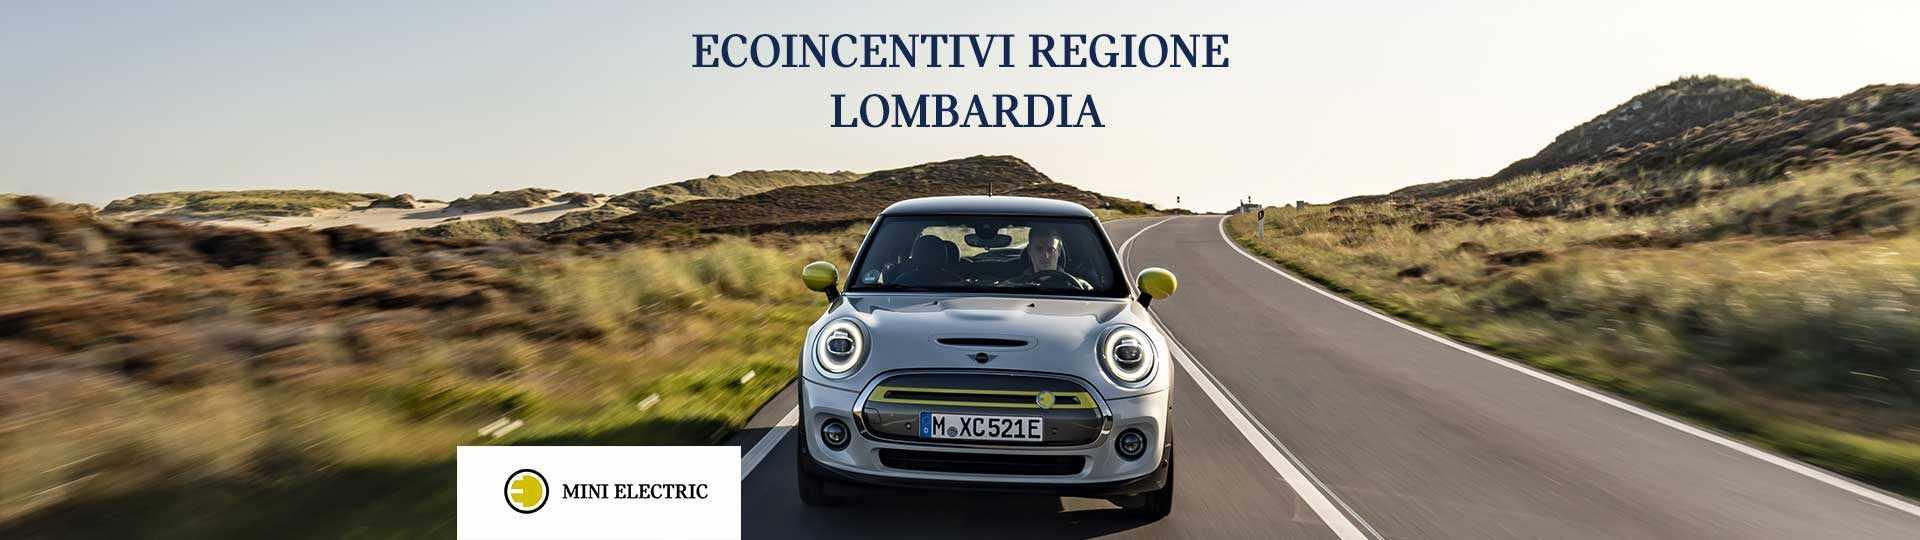 header_mini_regione_lombardia.jpg